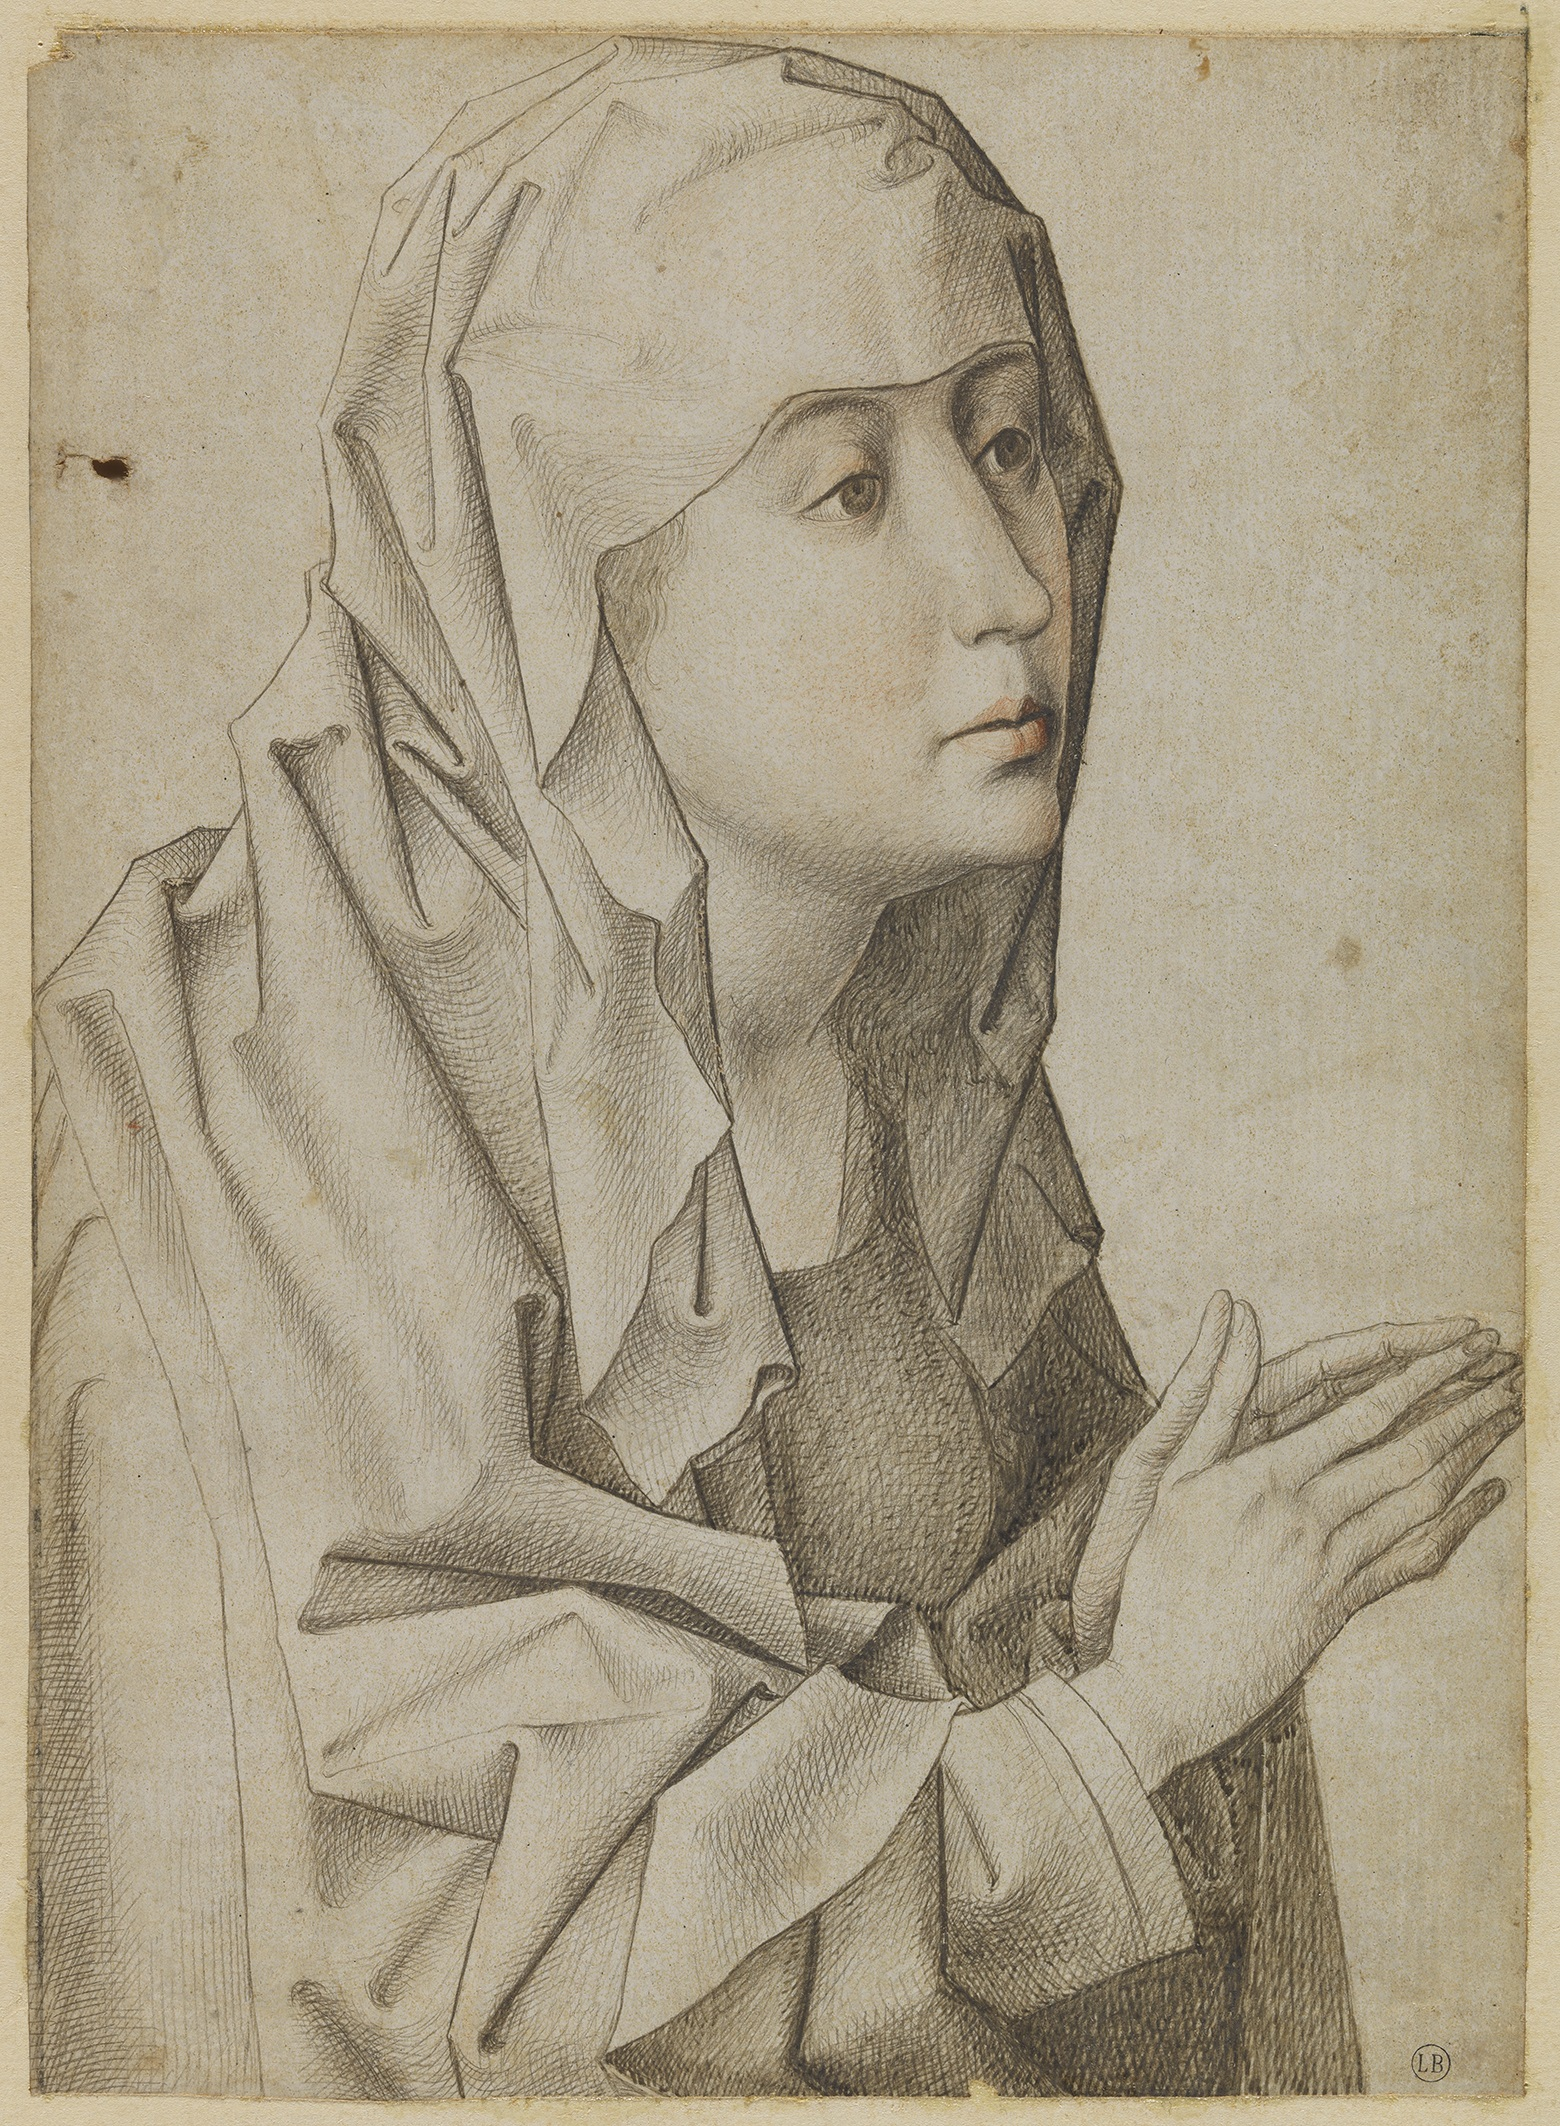 3. Follower of Rogier van der Weyden, Head of the Virgin, ca. 1480-1490, silverpoint and red chalk, 19.8 x 14.4 cm, inv. 214